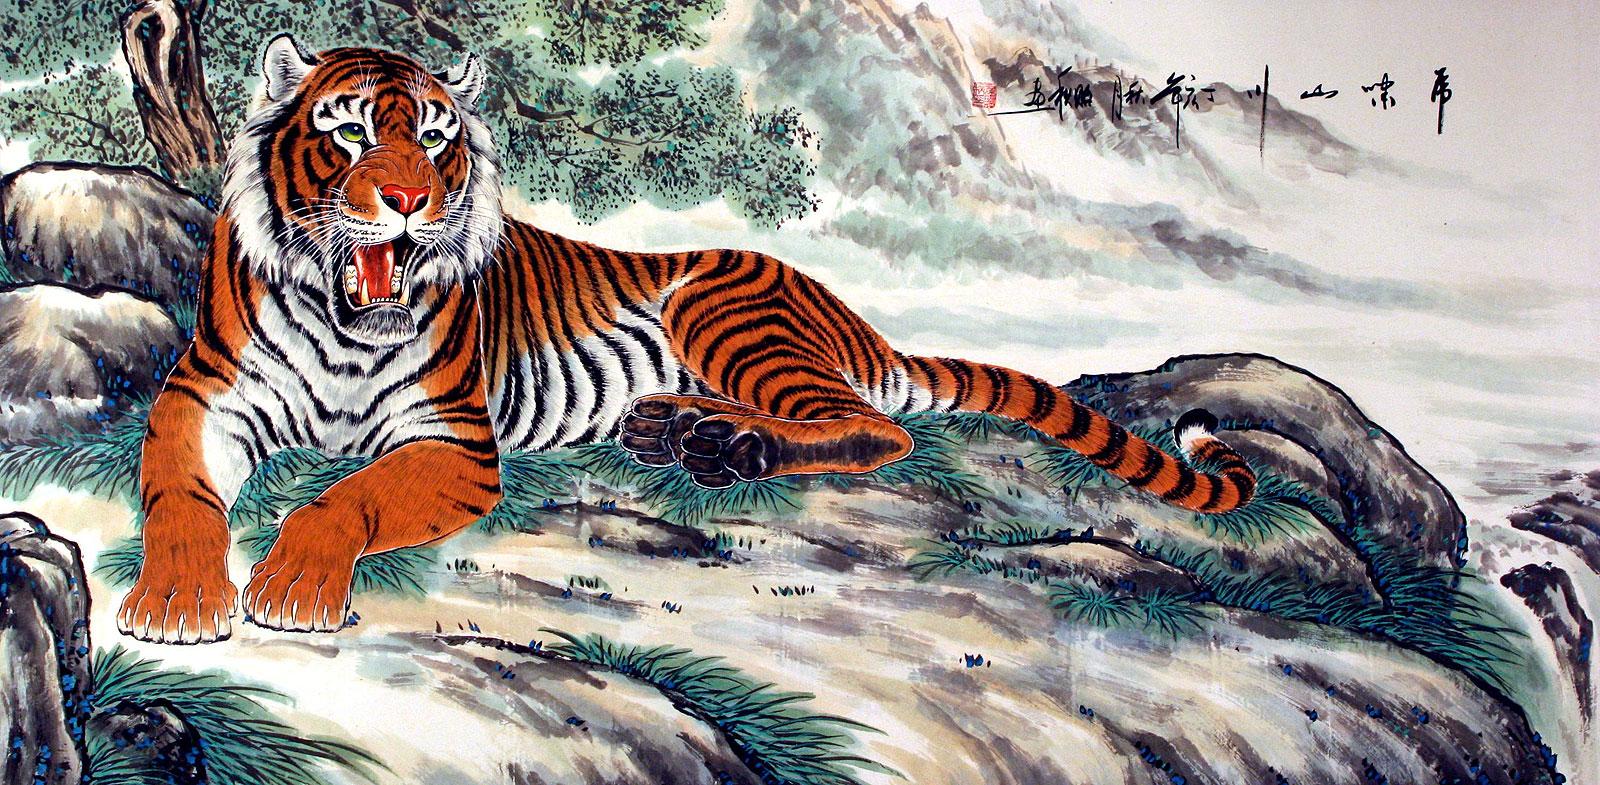 Ancient chinese tiger drawing - photo#21